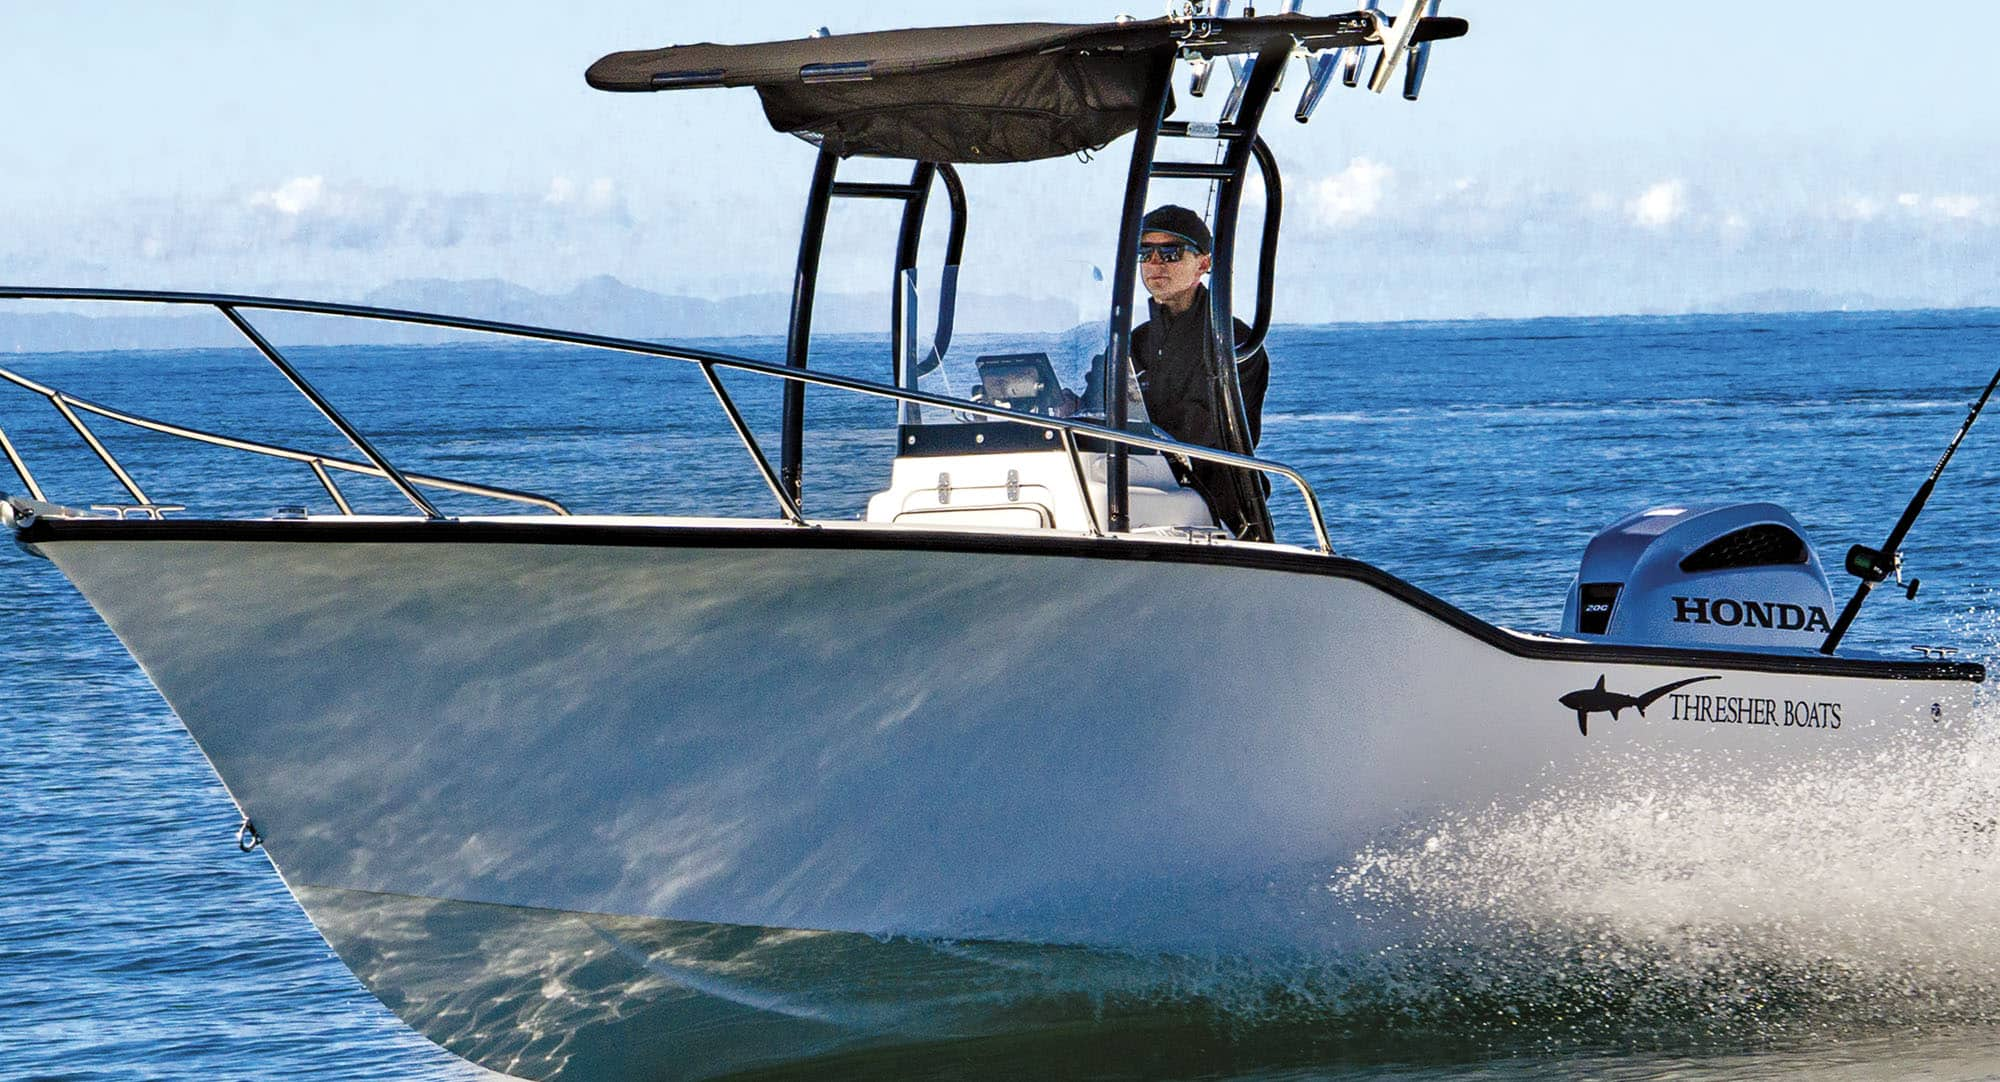 Thresher Boats center console